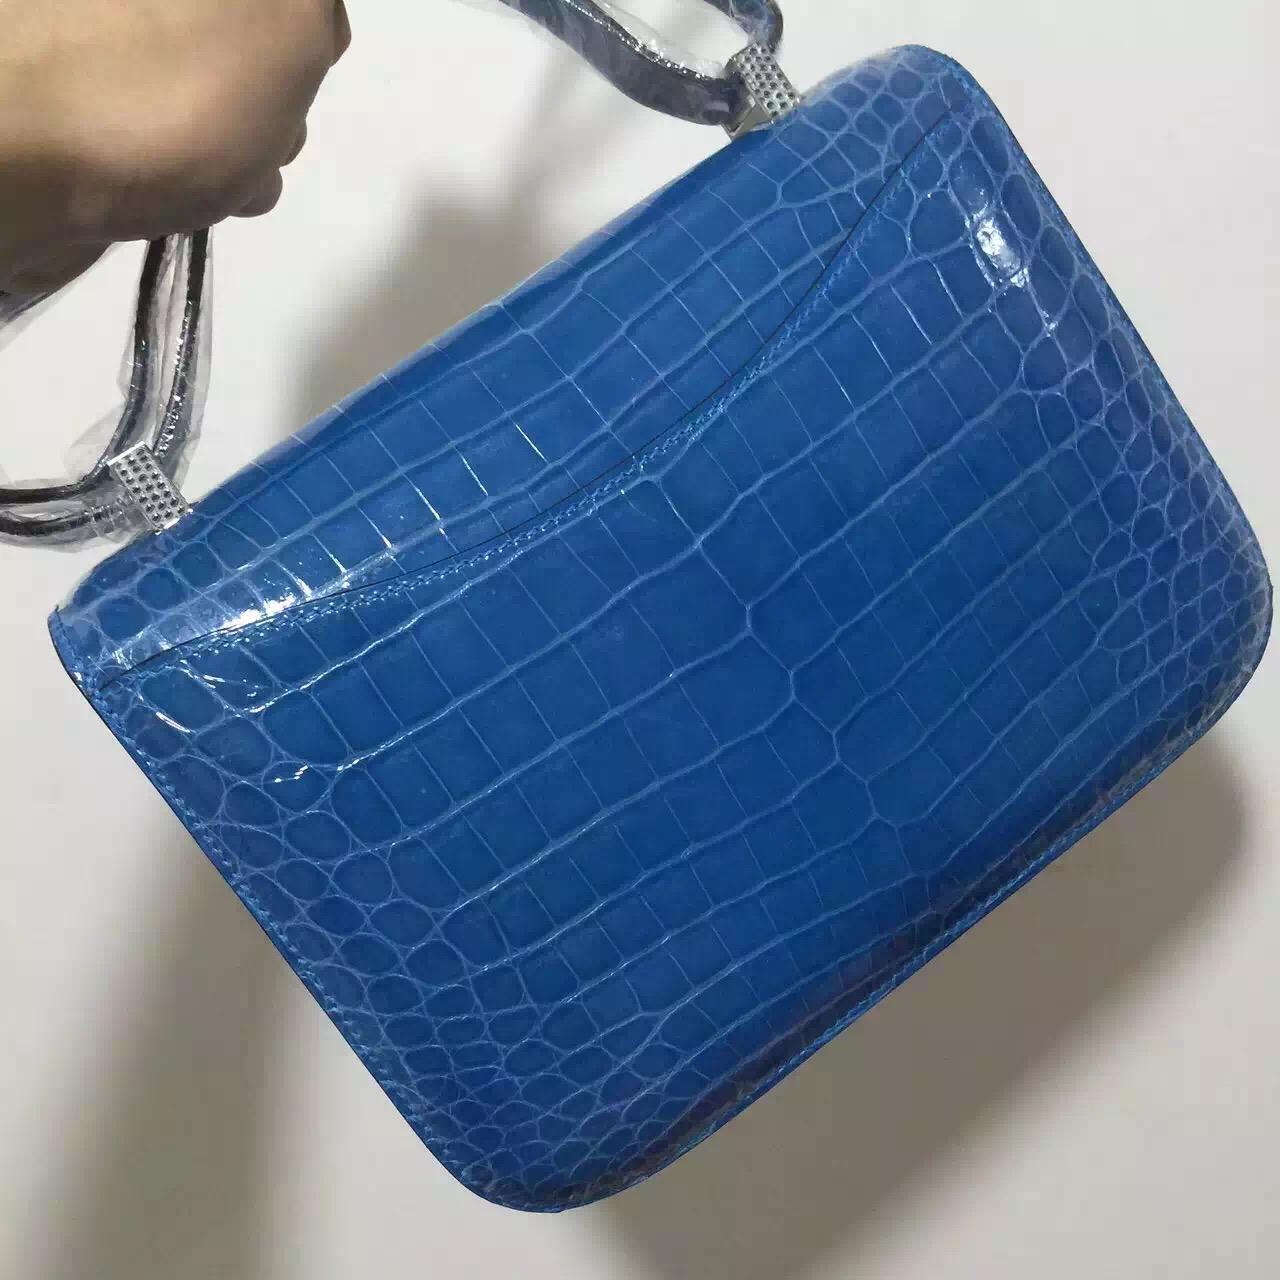 Online Store Hermes Constance Bag24CM Blue Izmir Crocodile Shiny Leather